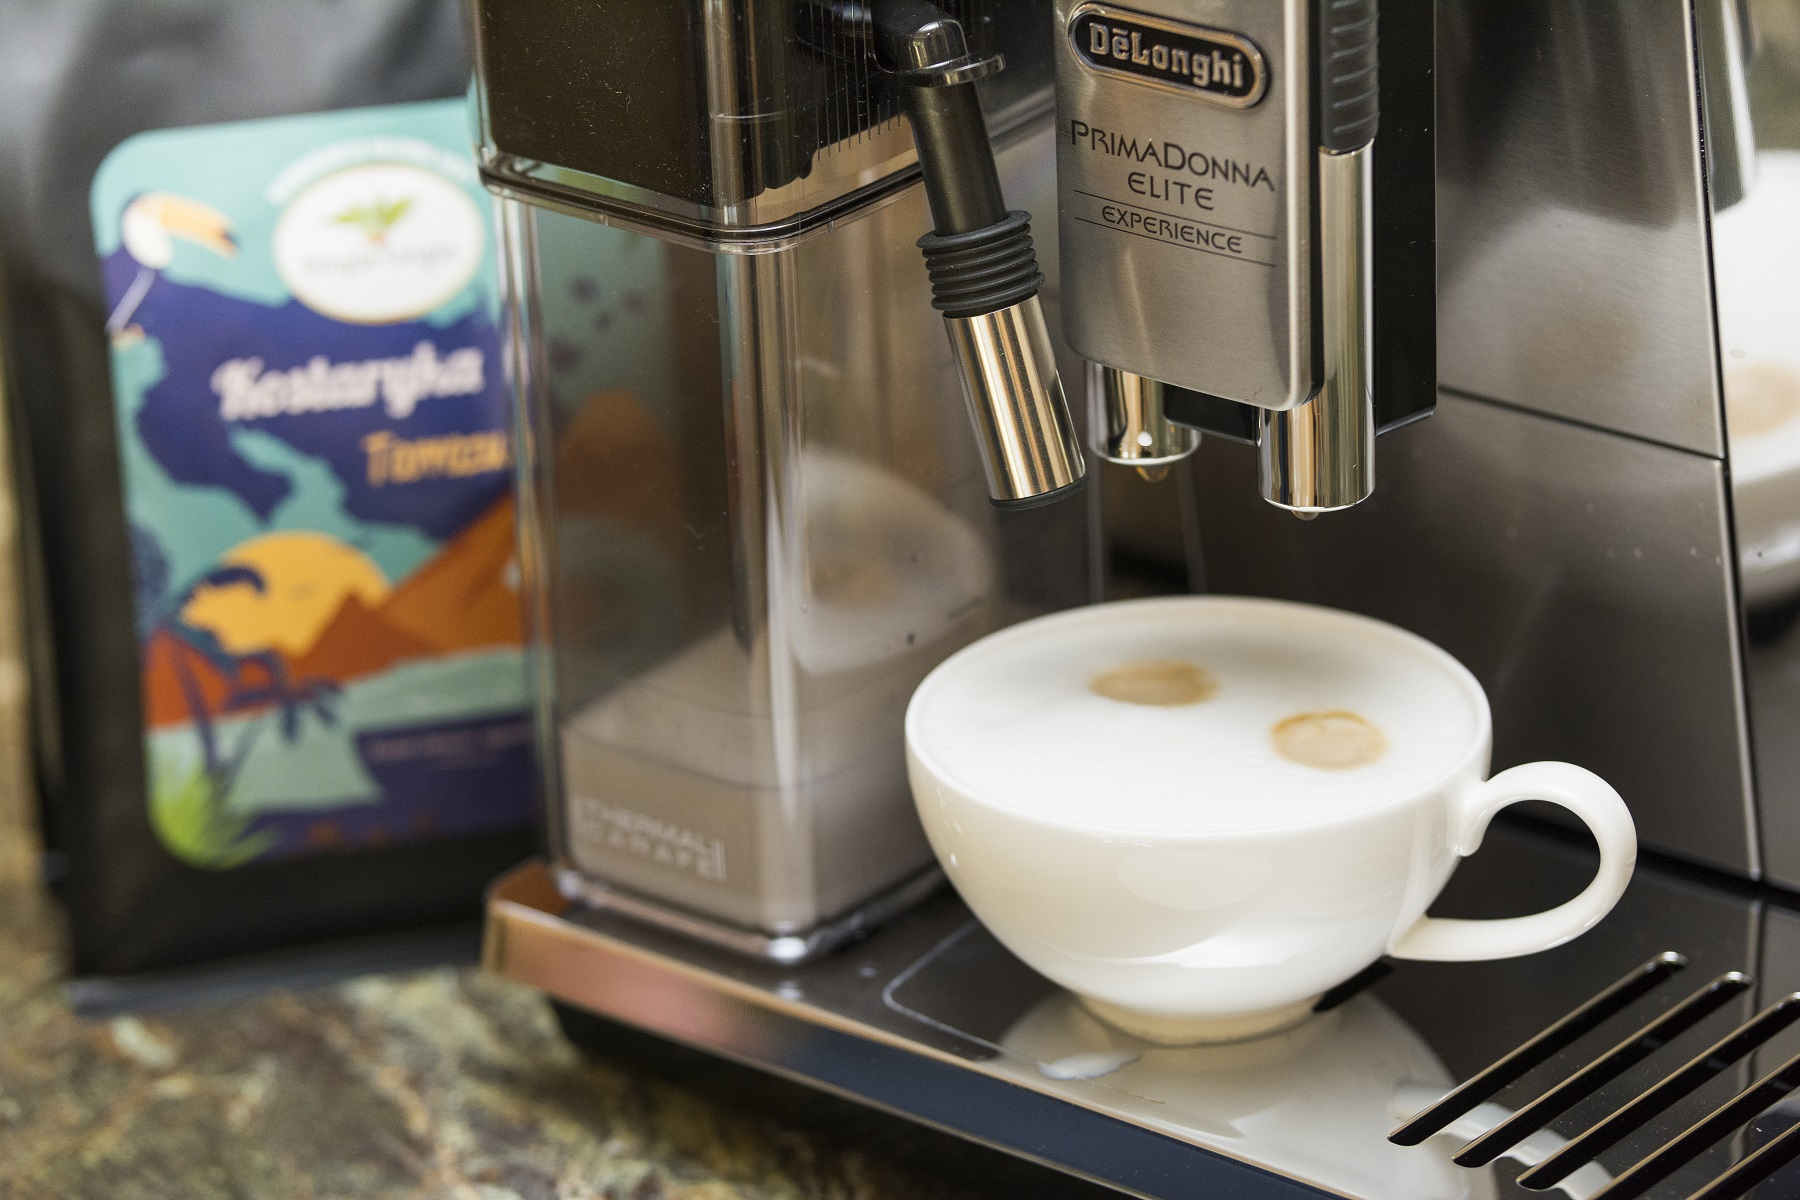 LatteCrema - System mleczny w ekspresach De'Longhi